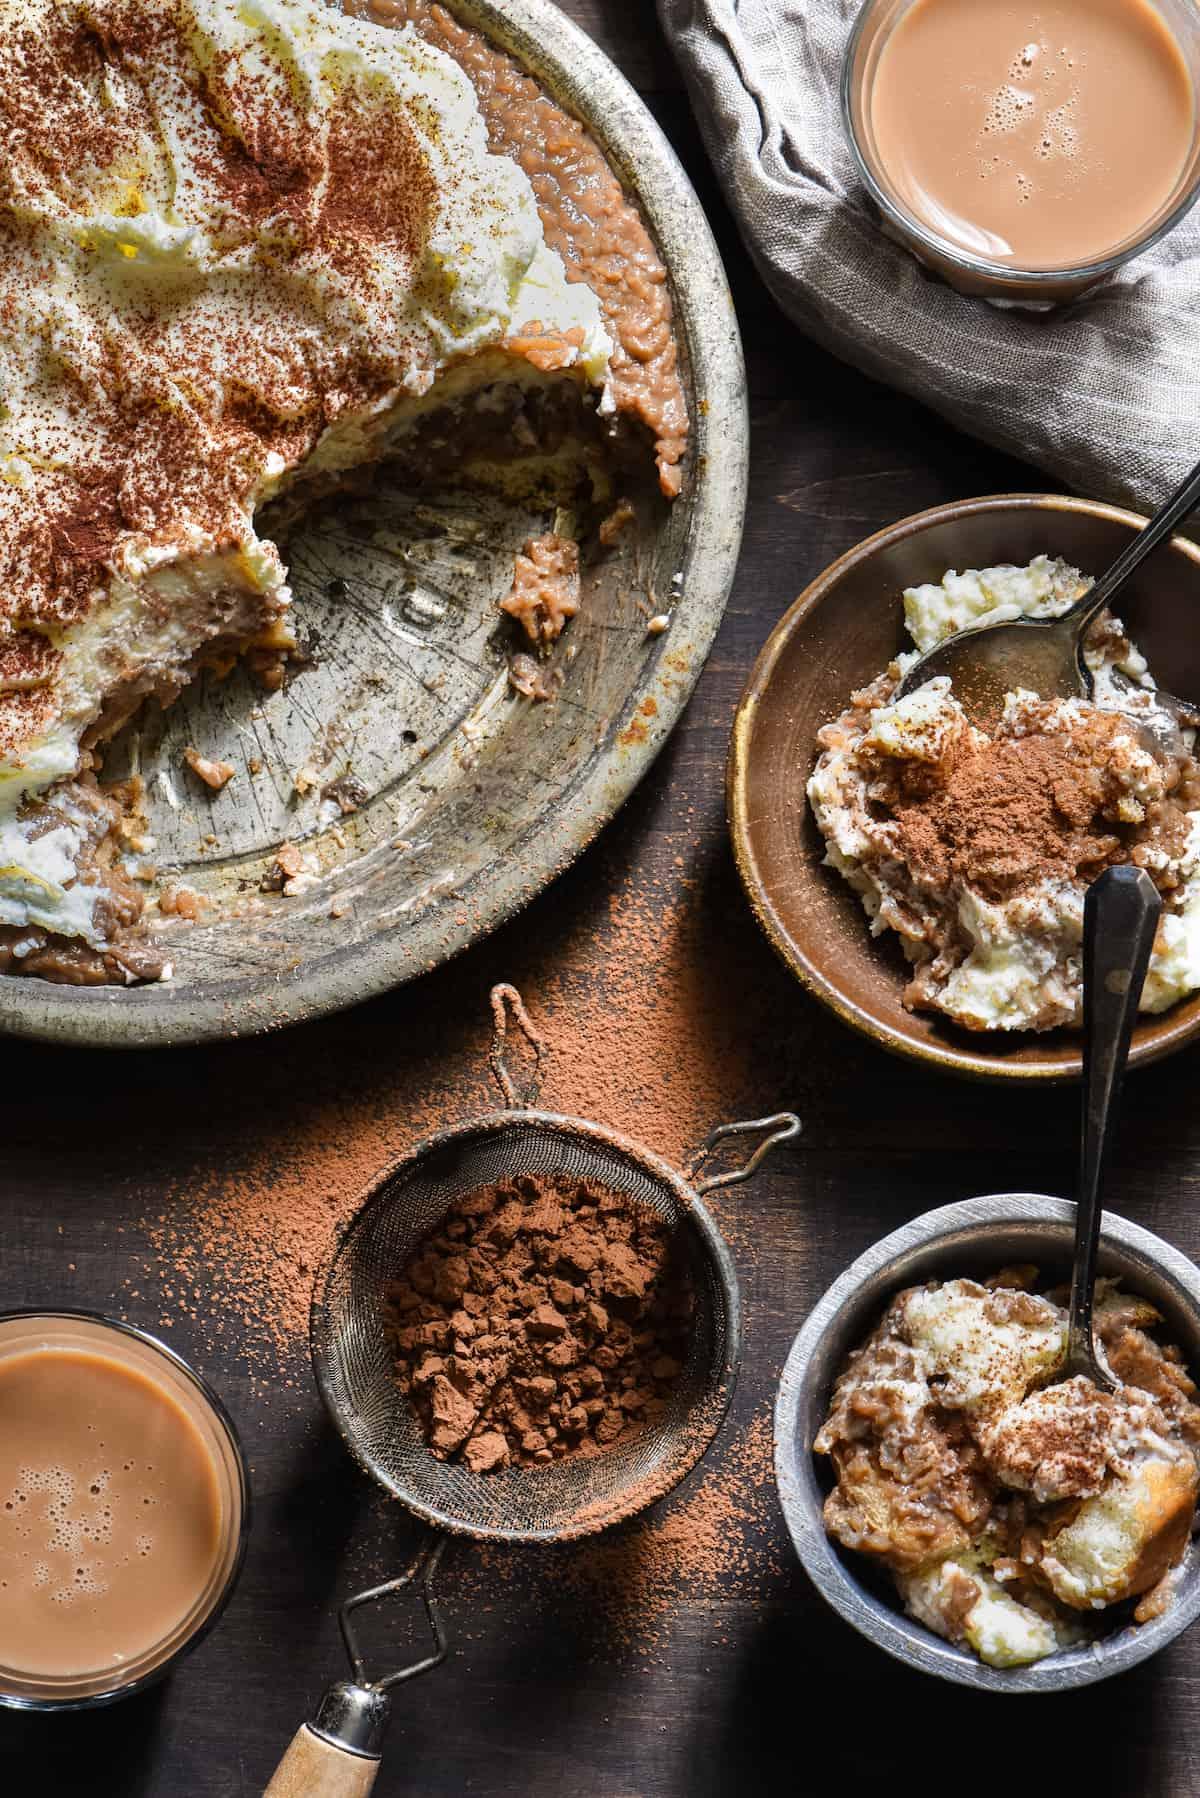 Rice Pudding Tiramisu - Layers of coffee-soaked ladyfingers, coffee rice pudding, and mascarpone whipped cream! | foxeslovelemons.com